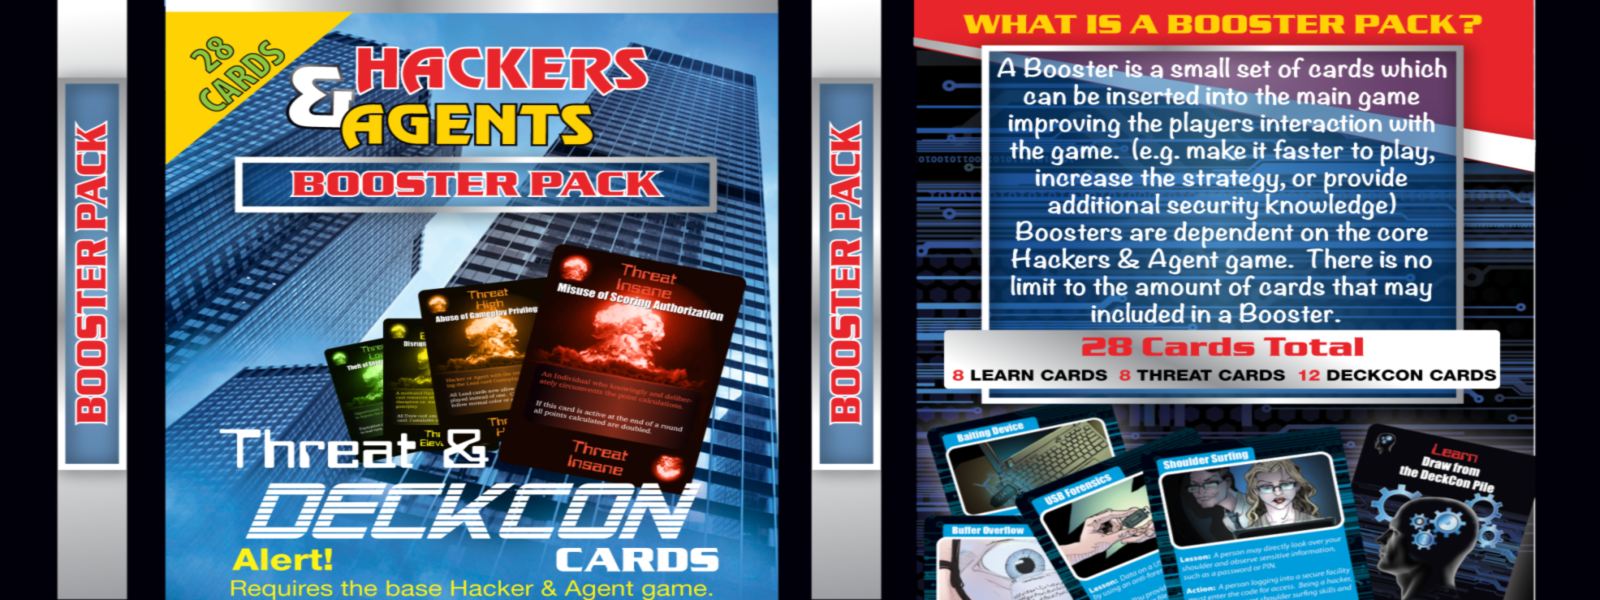 Hackers & Agents Threat Deckcon Booster